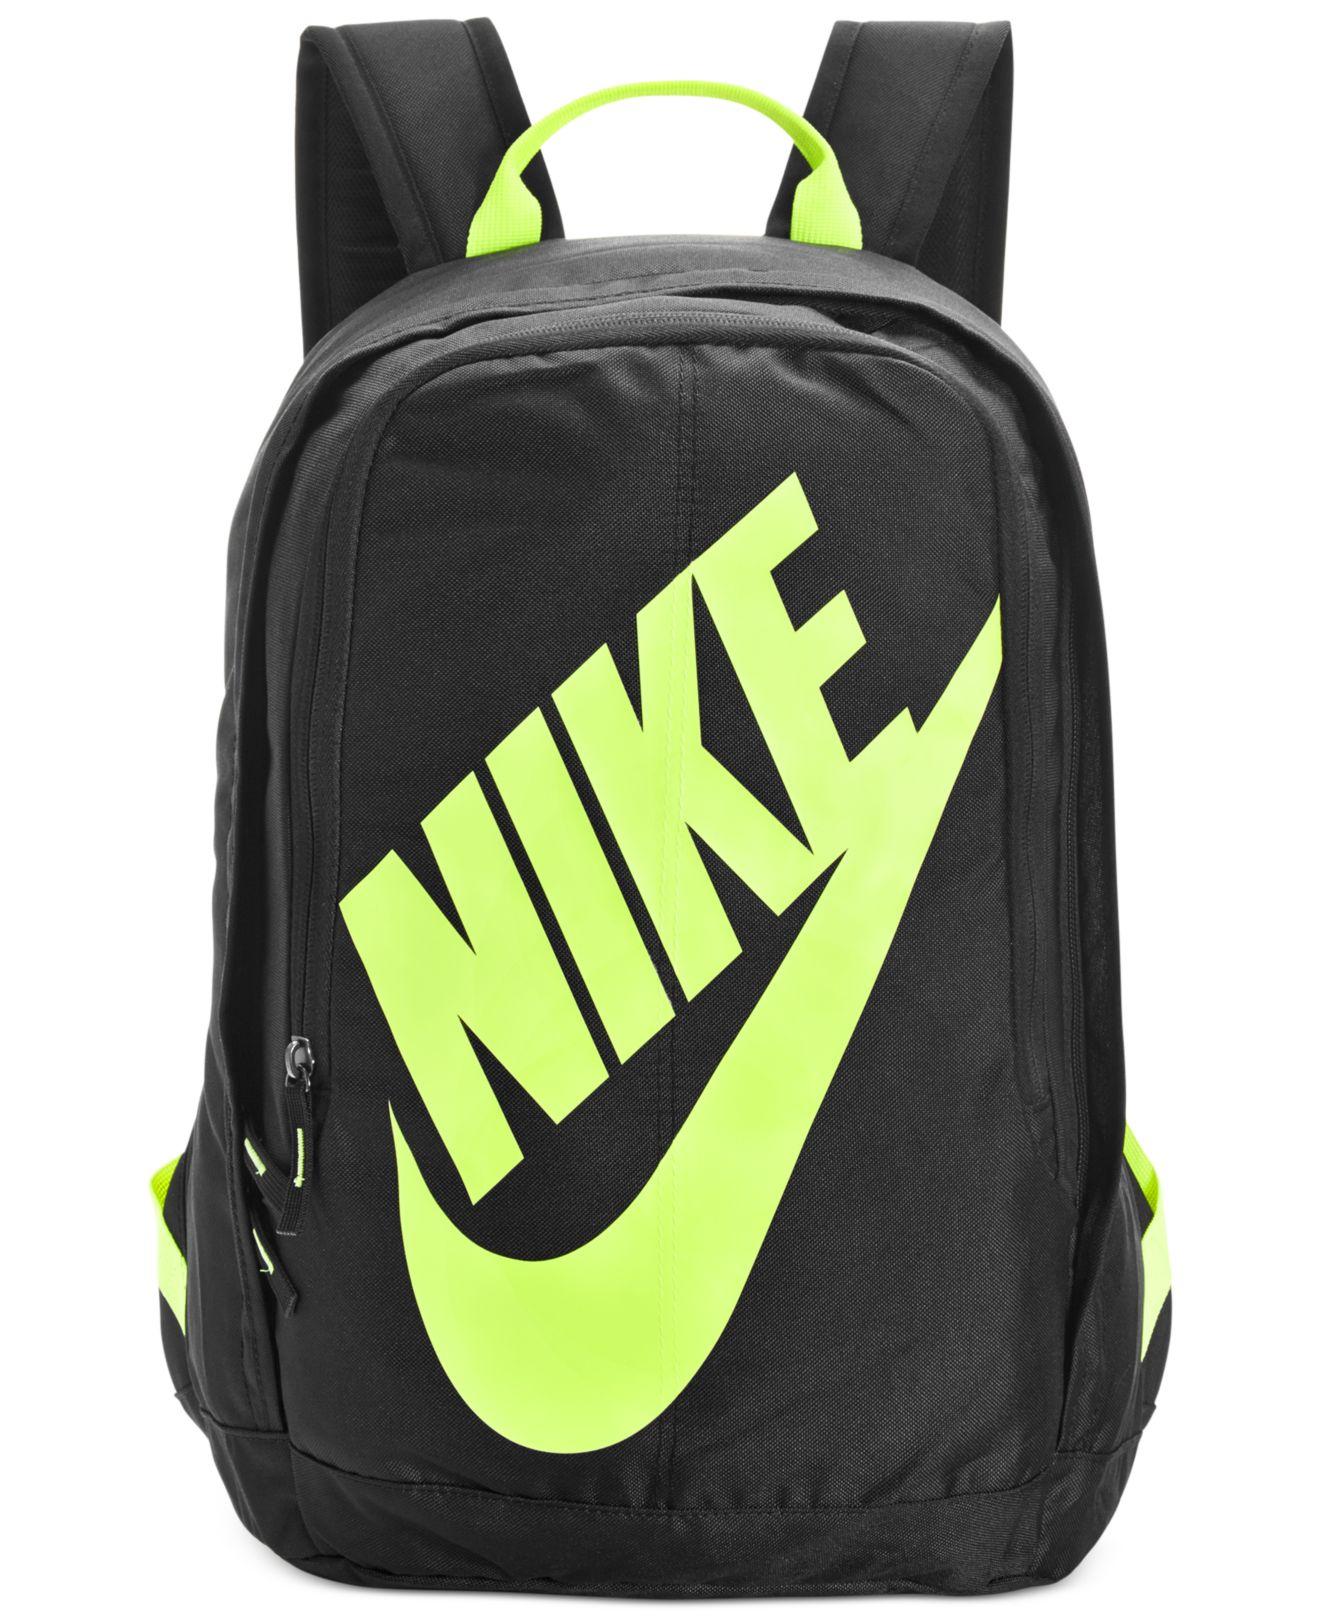 Lyst - Nike Hayward Neon Backpack in Black for Men 92e83b205664f